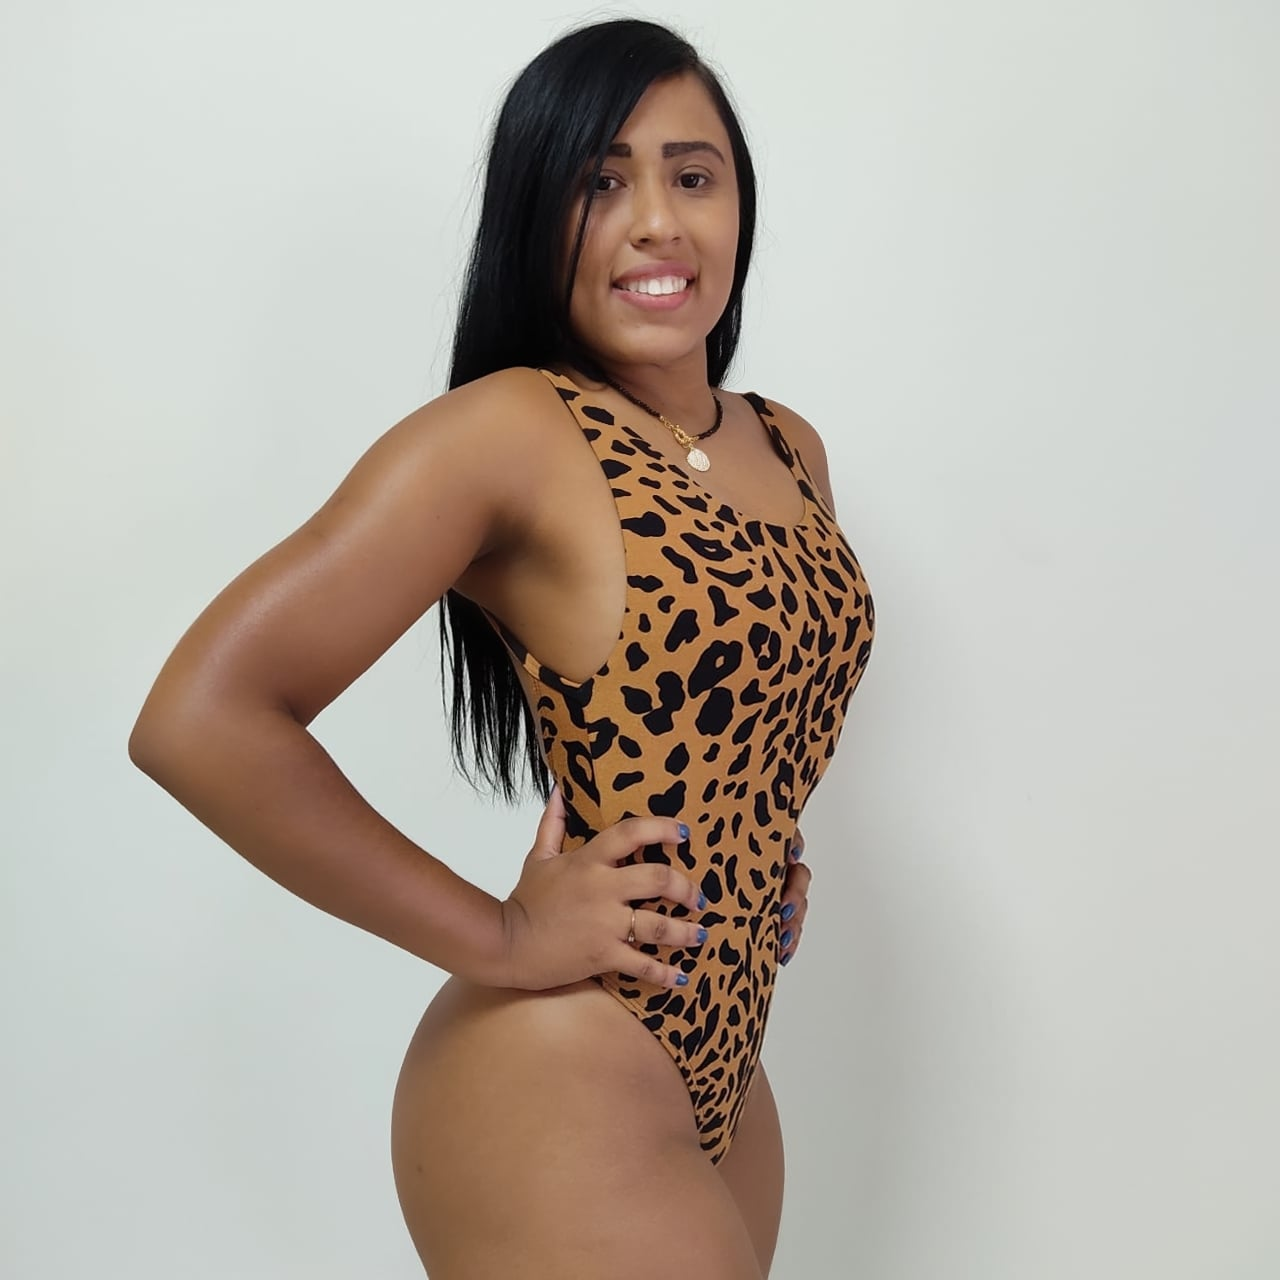 Maiô Fio Dental Estampado Animal Print Ref 57